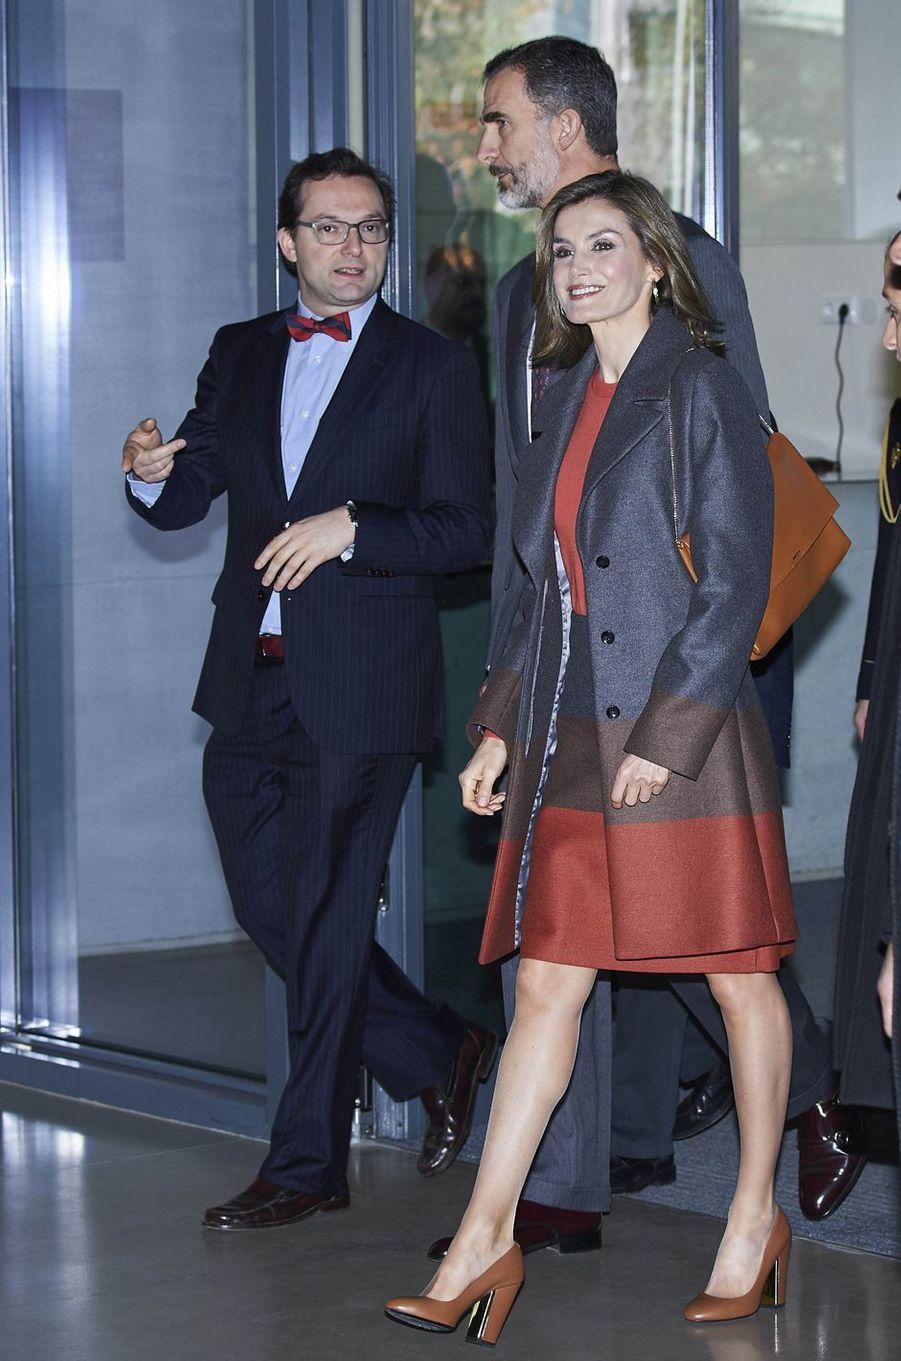 La reine Letizia et le roi Felipe VI d'Espagne à Porto, le 29 novembre 2016